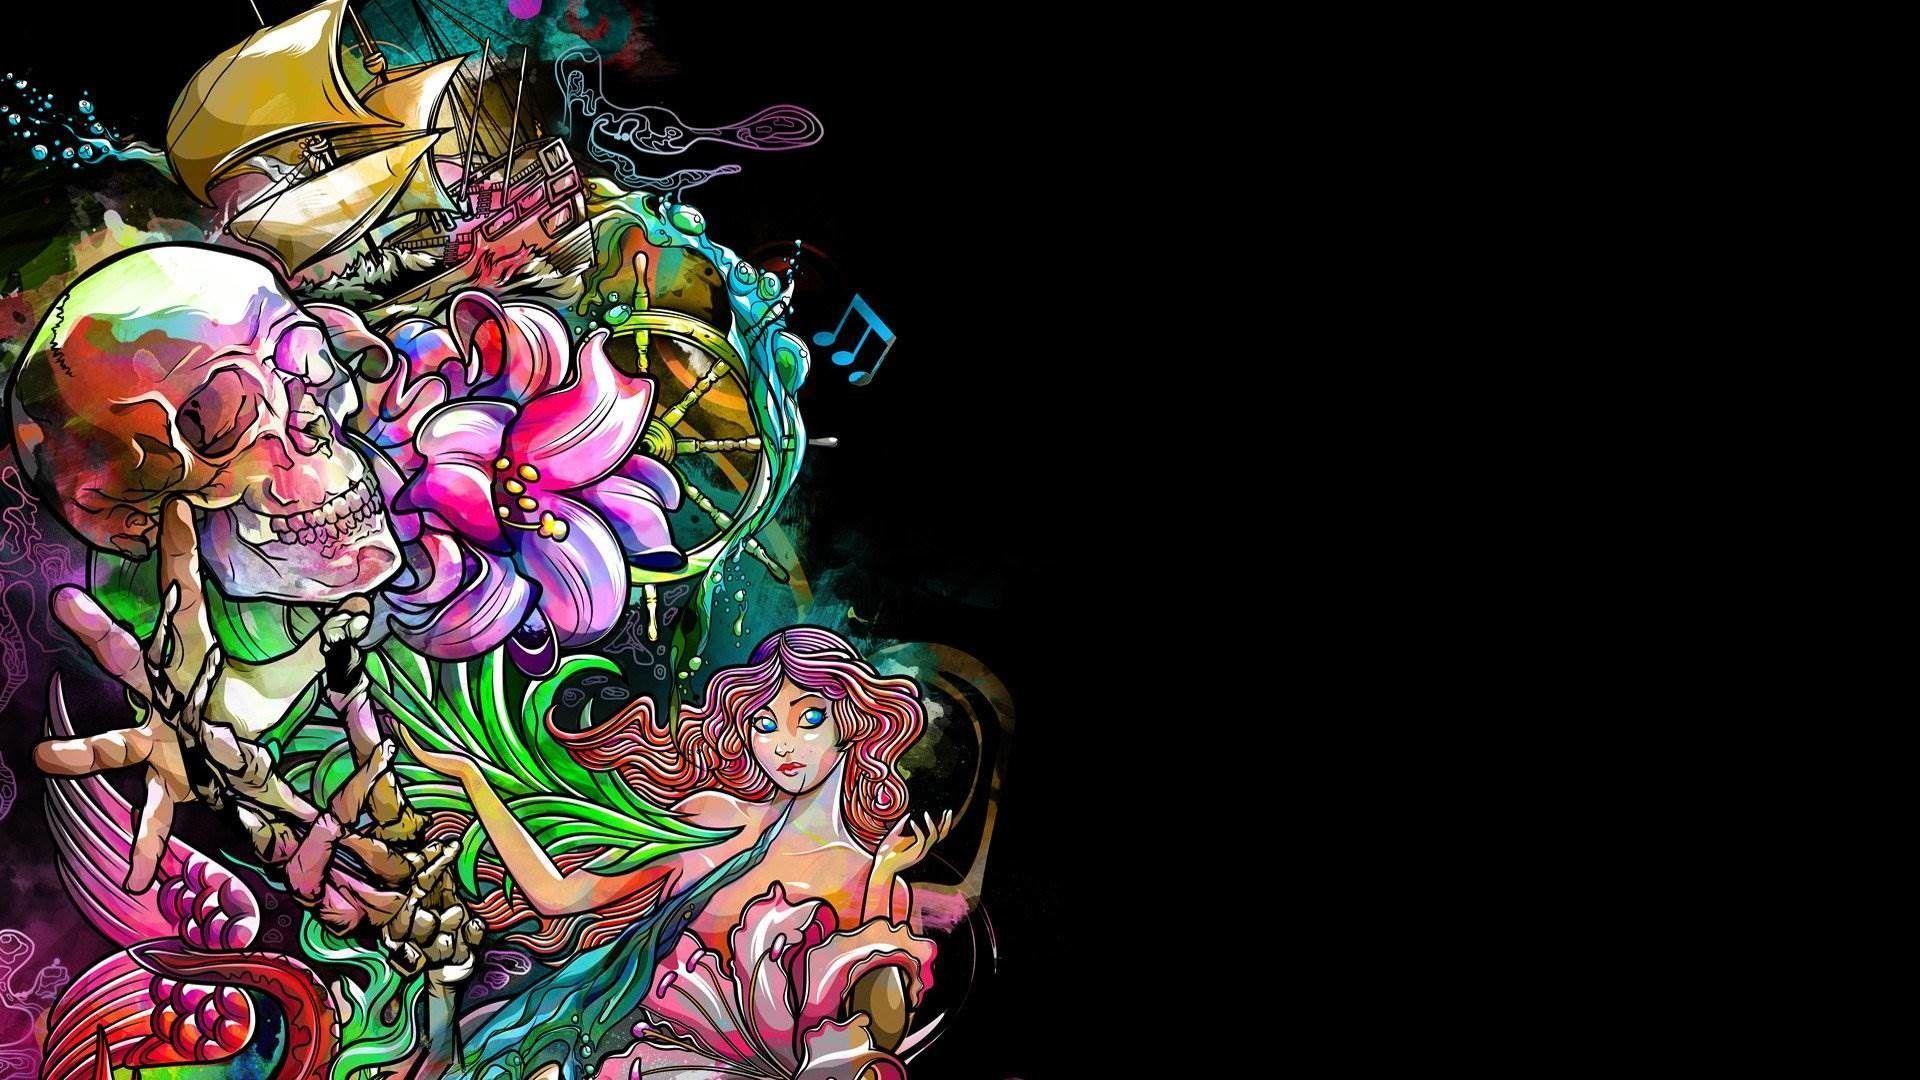 Tattoo Hd Wallpapers Wallpaper Cave